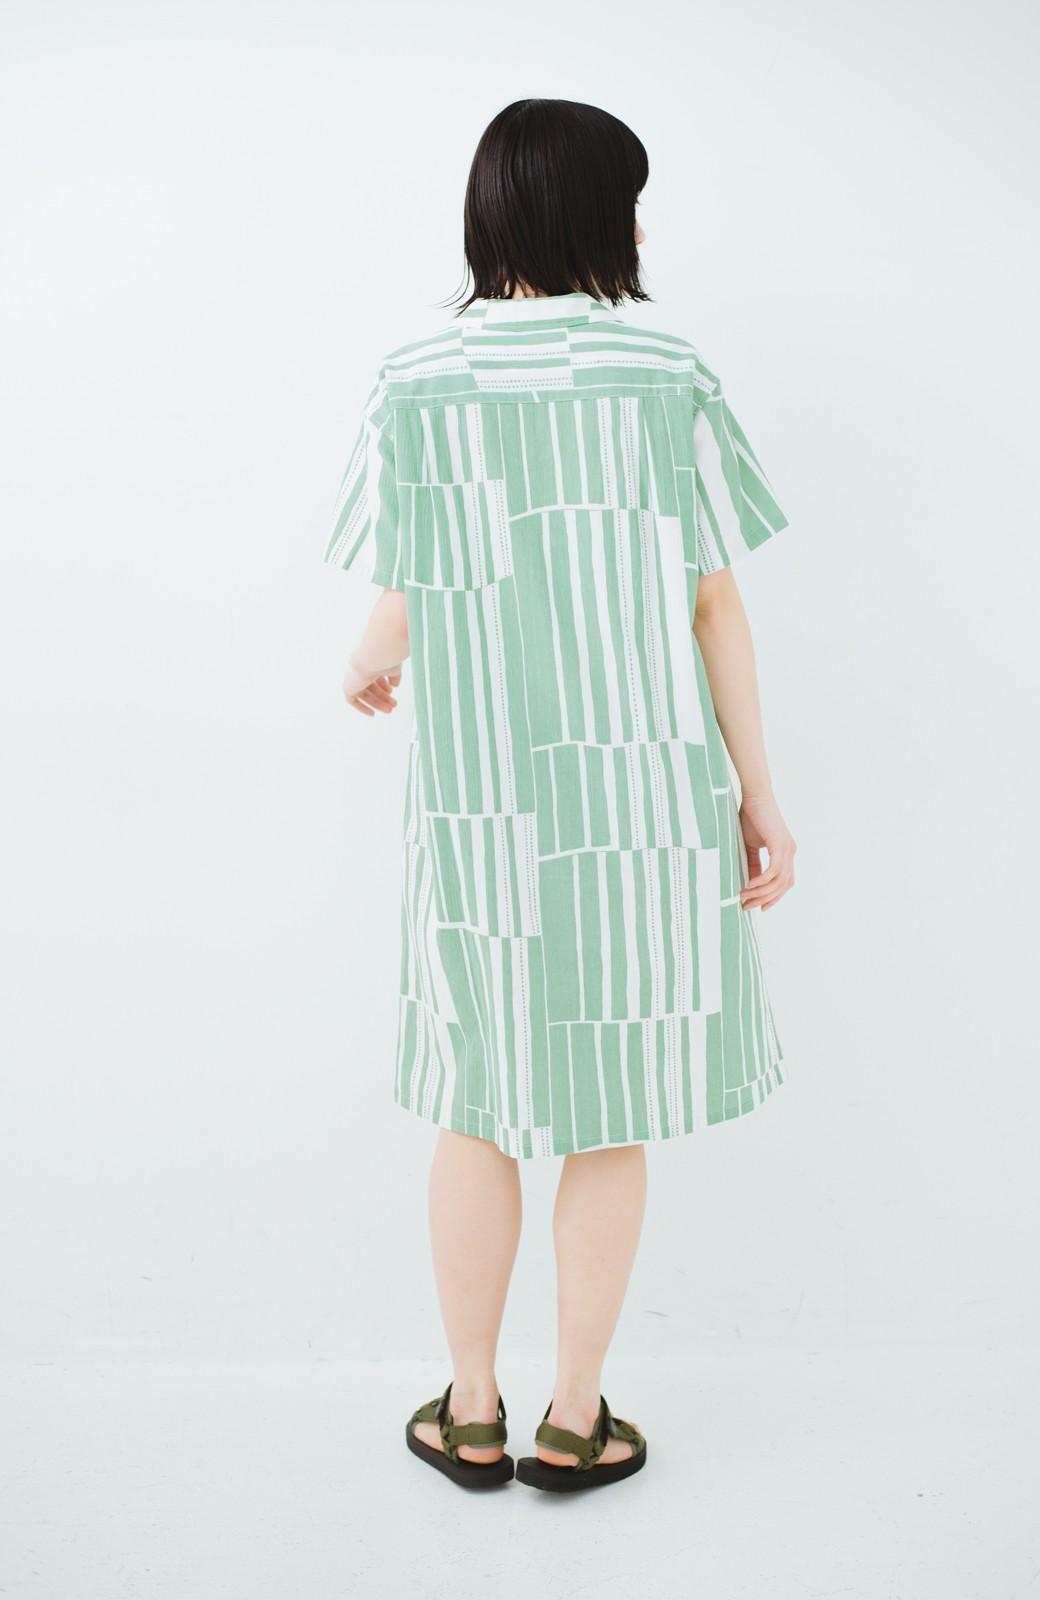 haco! 京都の浴衣屋さんと作った浴衣生地のシャツワンピース <グリーン系その他>の商品写真15